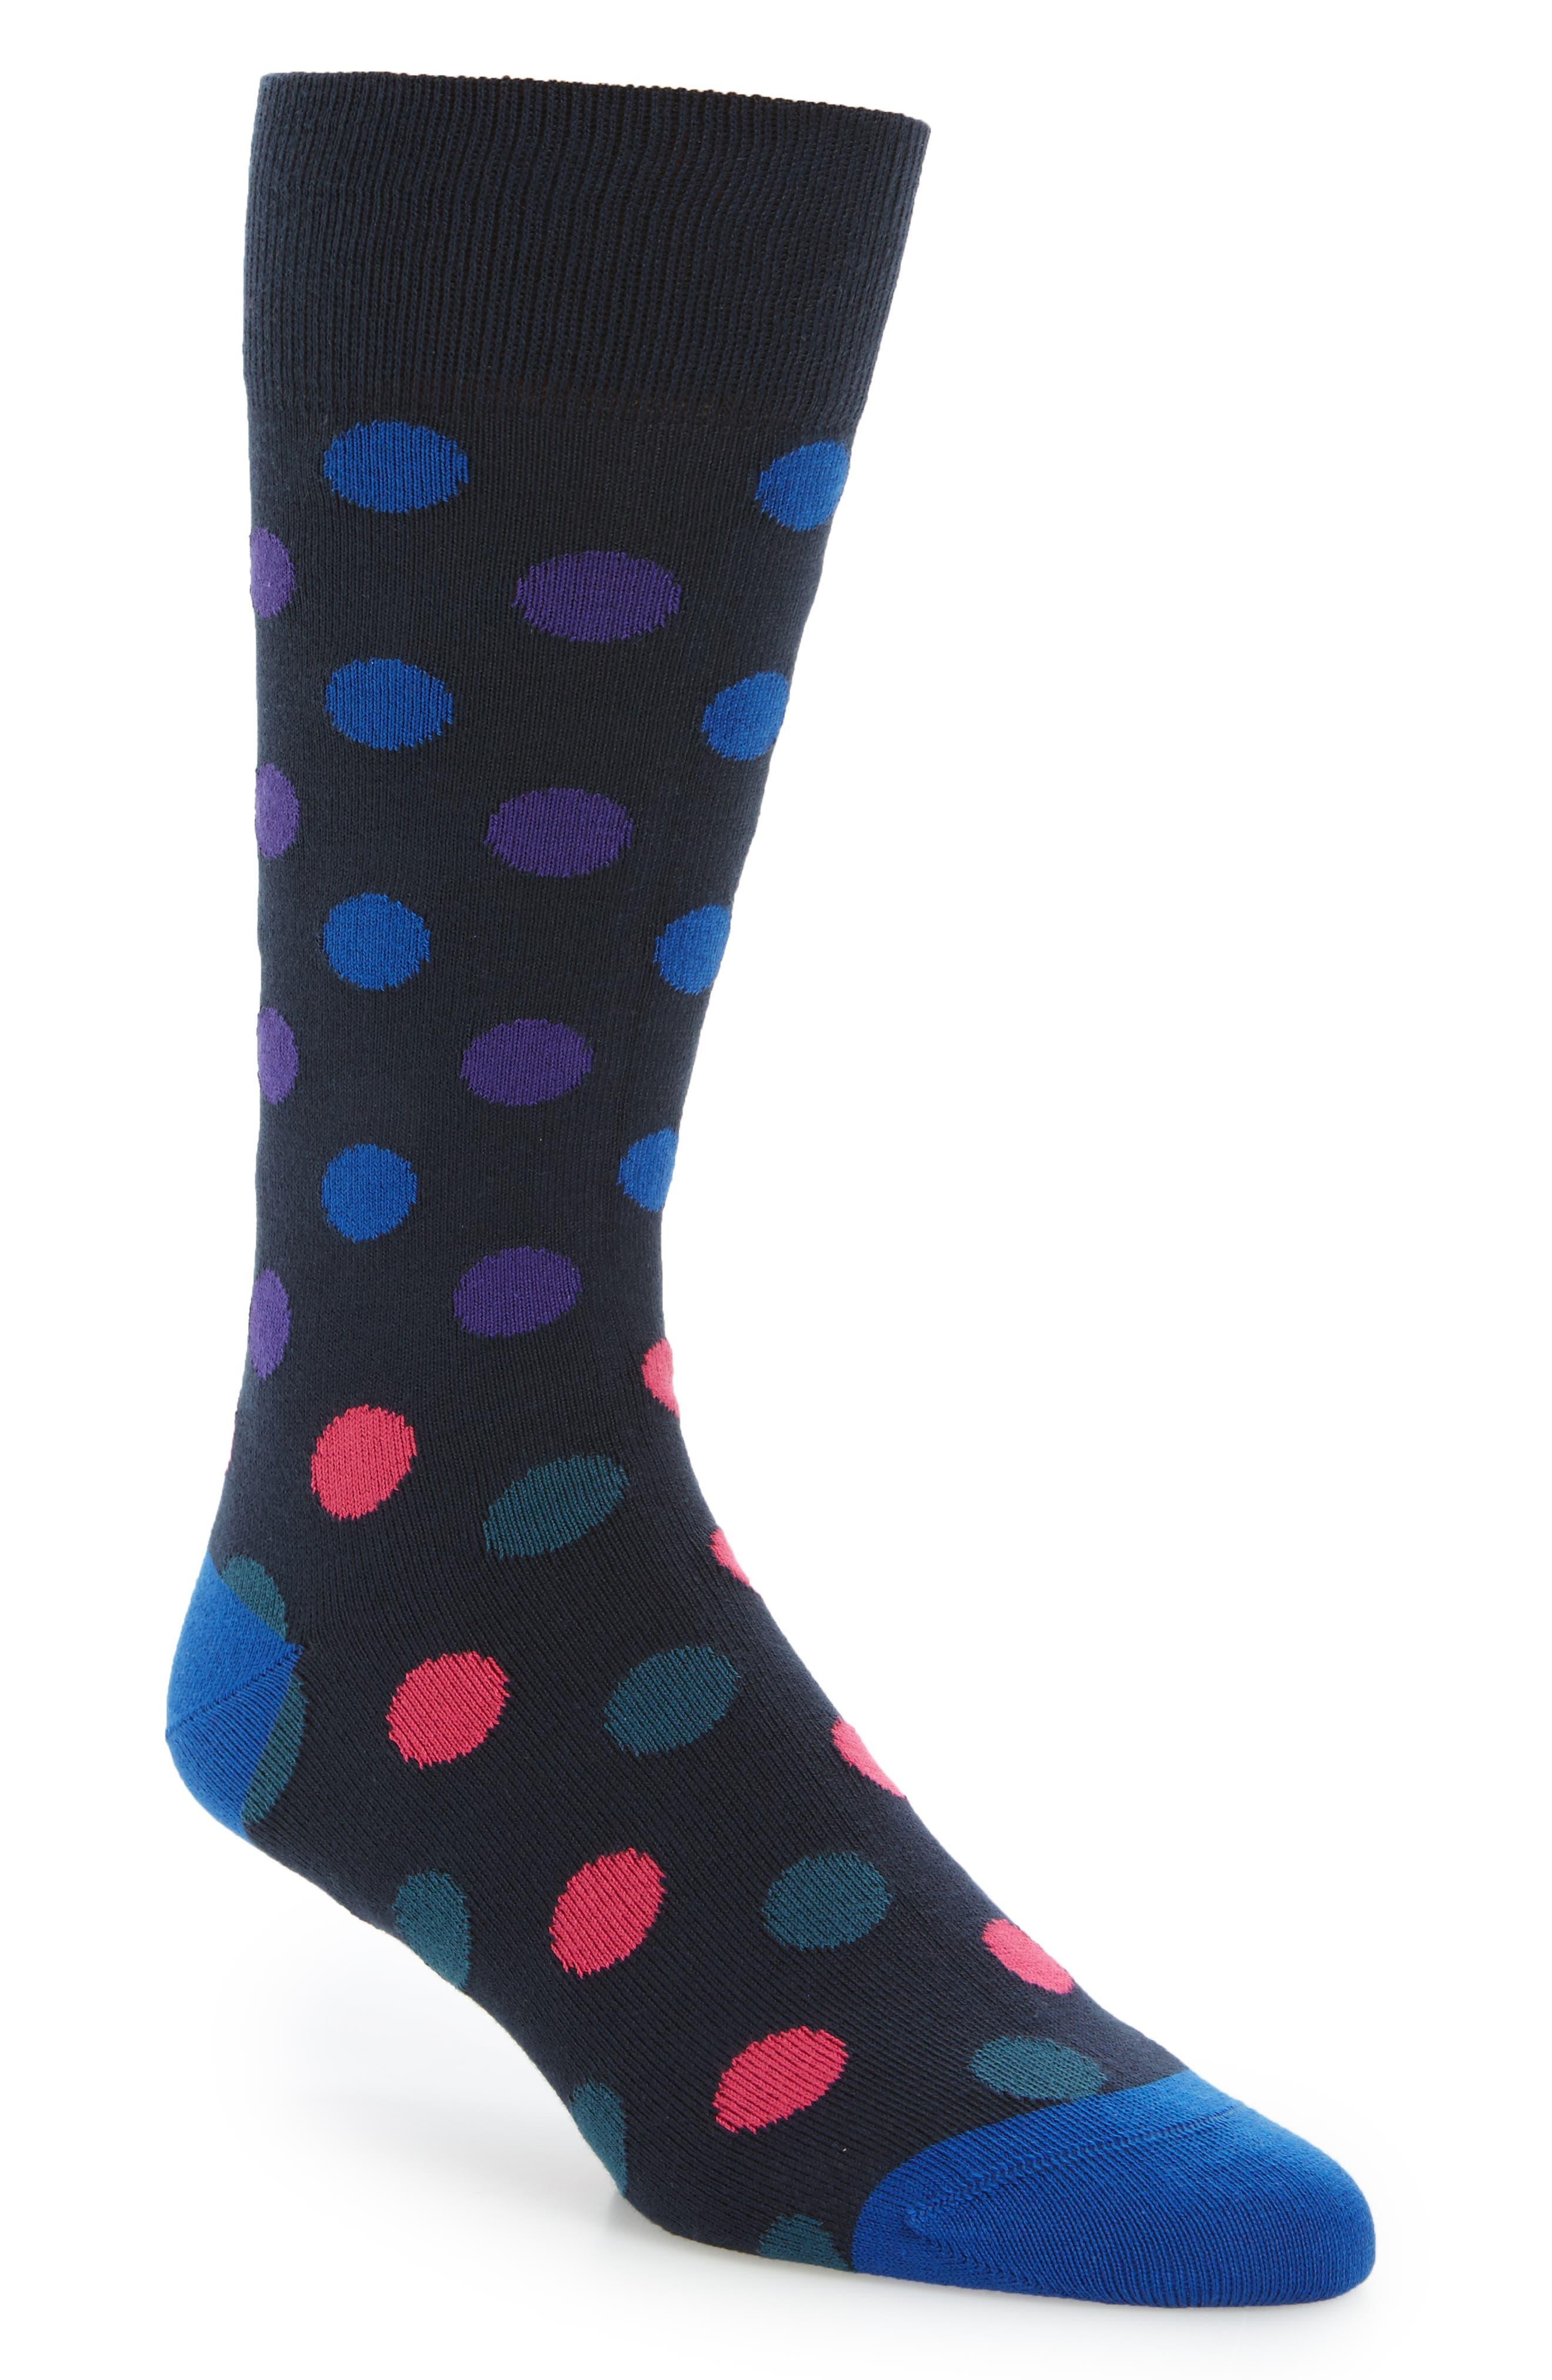 Samic Polka Dot Socks,                         Main,                         color, Blue